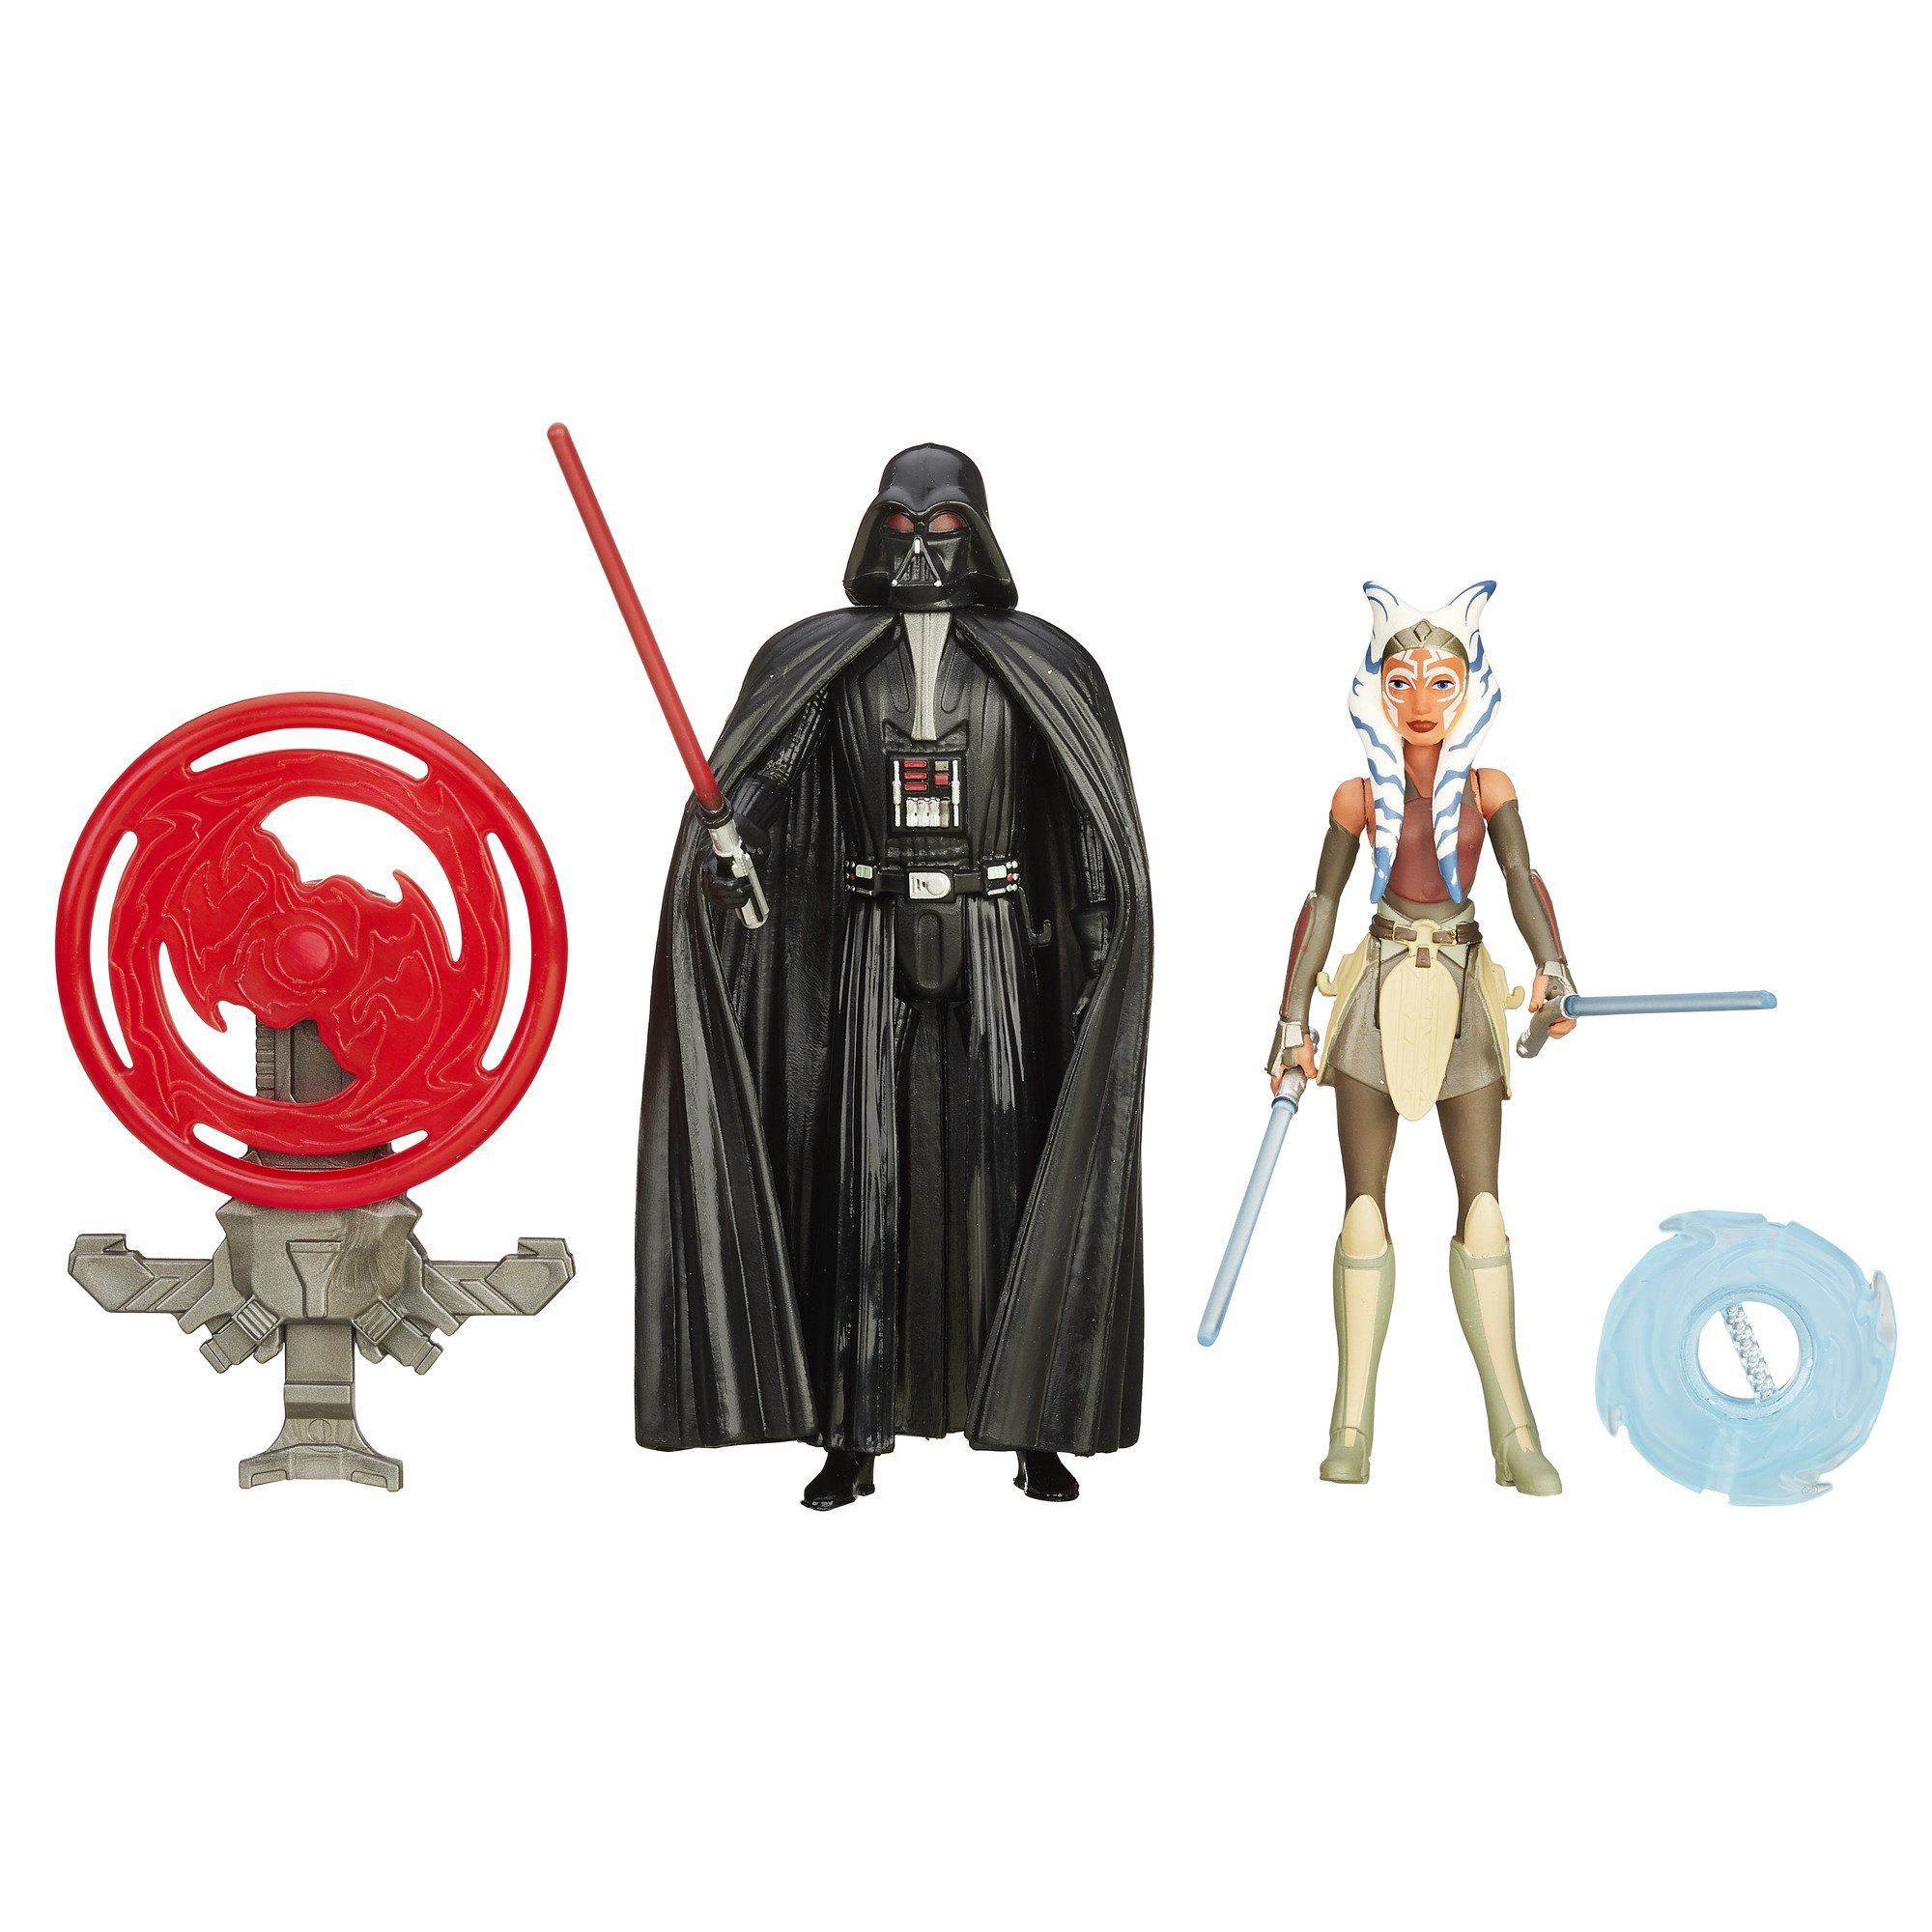 Star Wars Rebels 3.75-Inch Figure 2-Pack Space Mission Darth Vader and Ahsoka